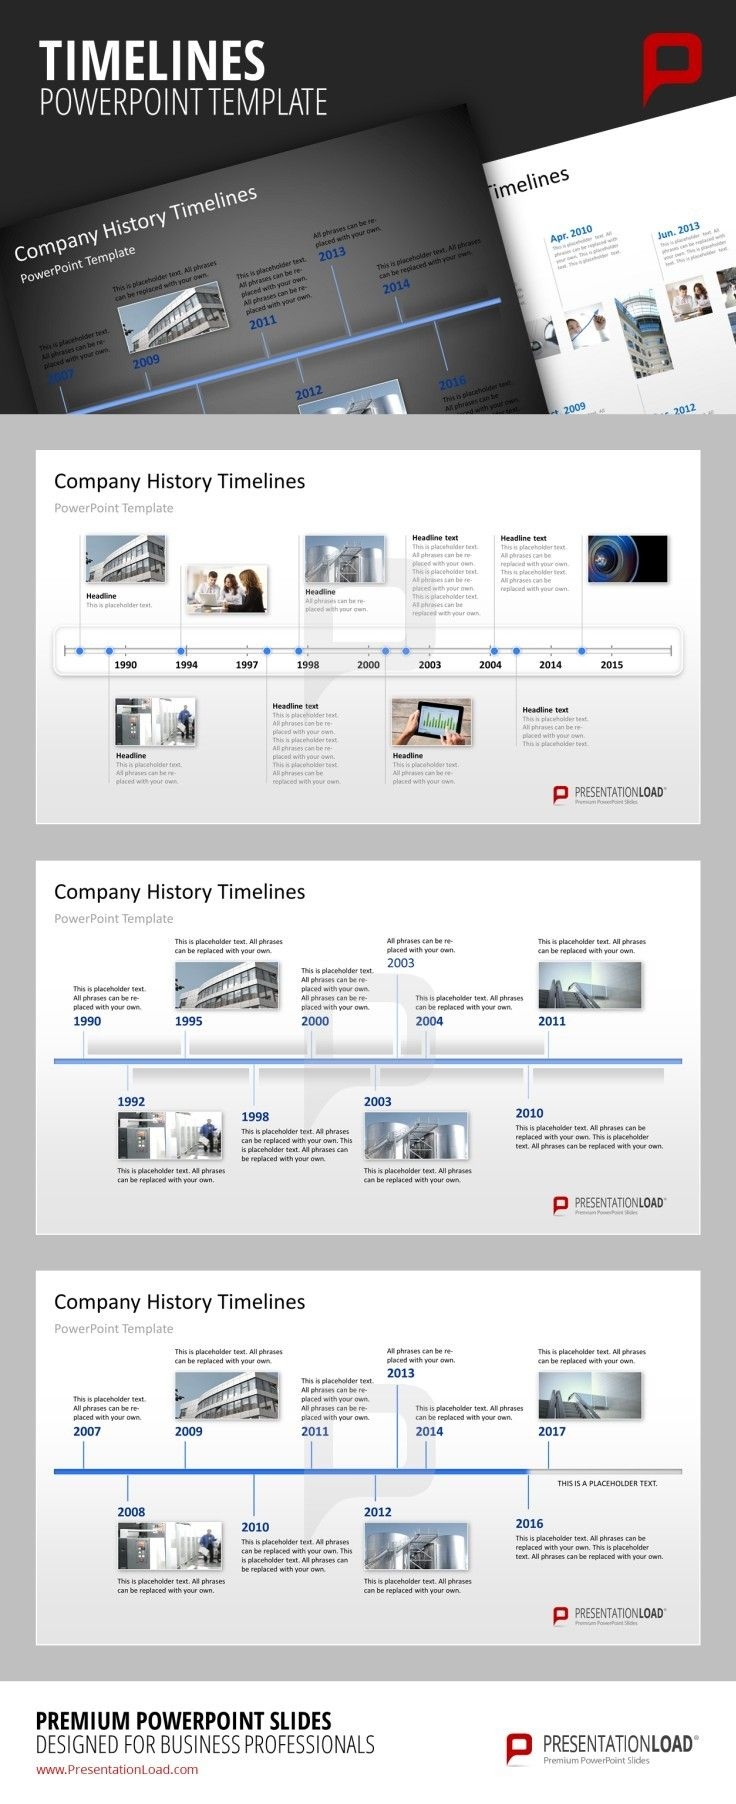 65 best design organizing powerpoint templates images on 3d spheres timeline powerpoint template presentationload presentationl toneelgroepblik Images